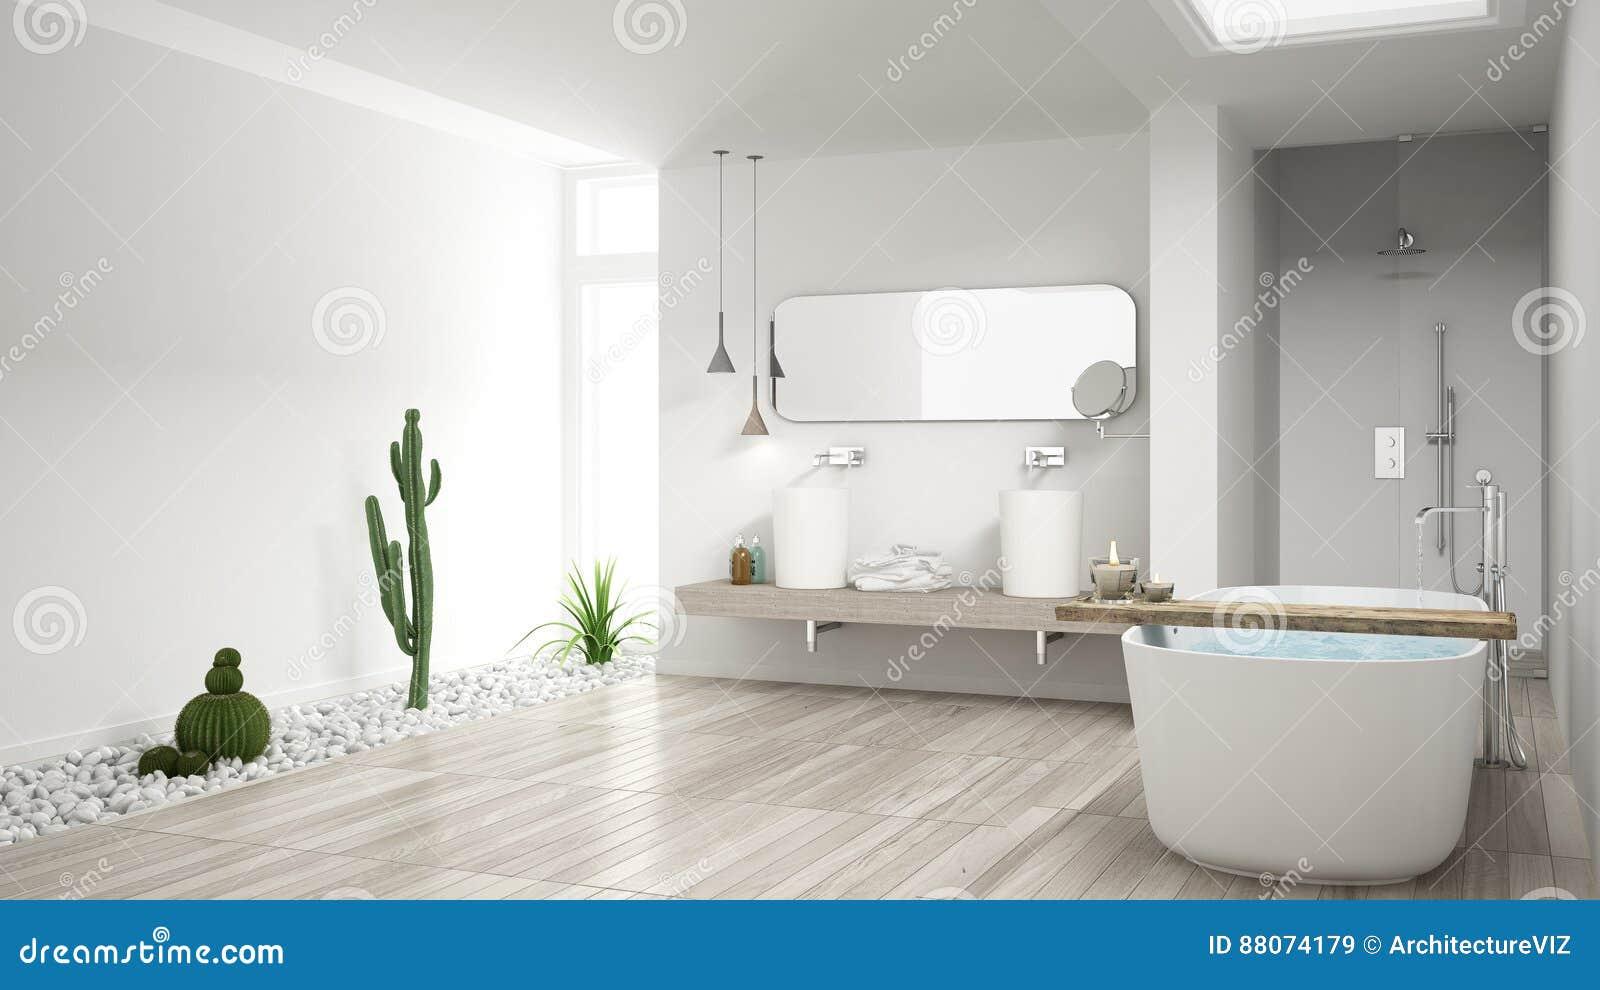 Minimalist White Bathroom With Succulent Garden, Wooden Floor An ...